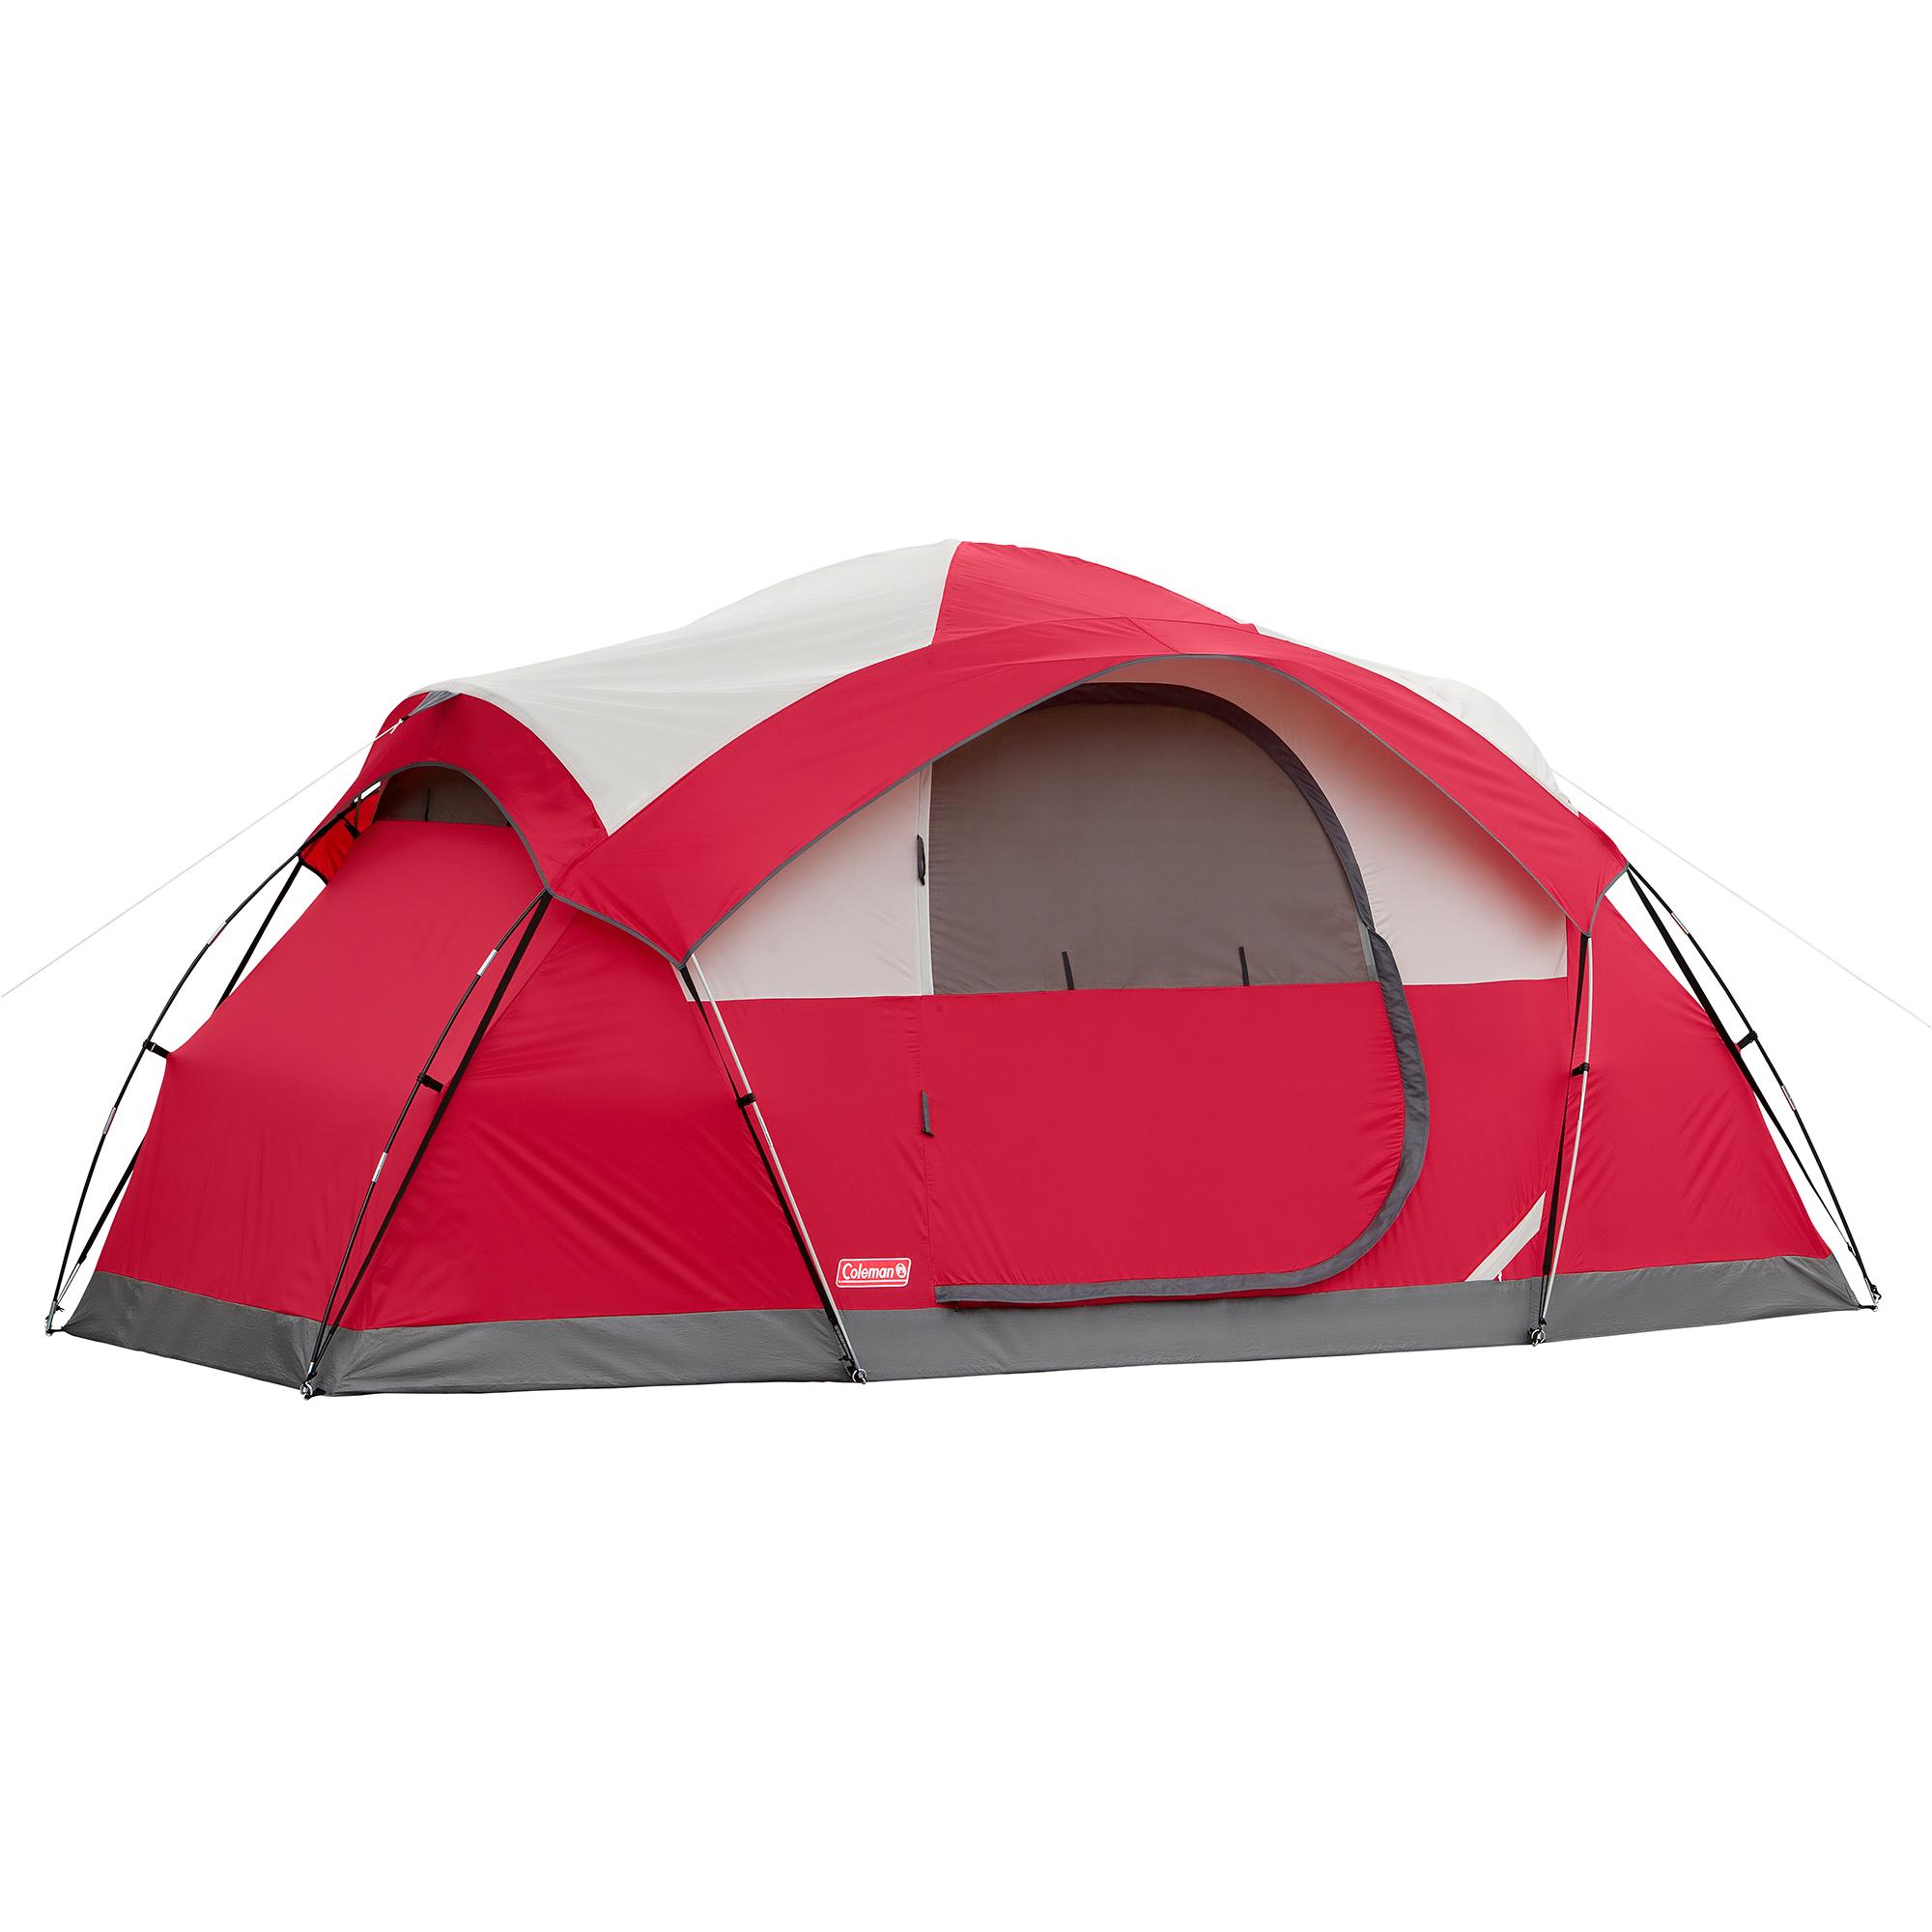 8-person tent via Walmart for $95